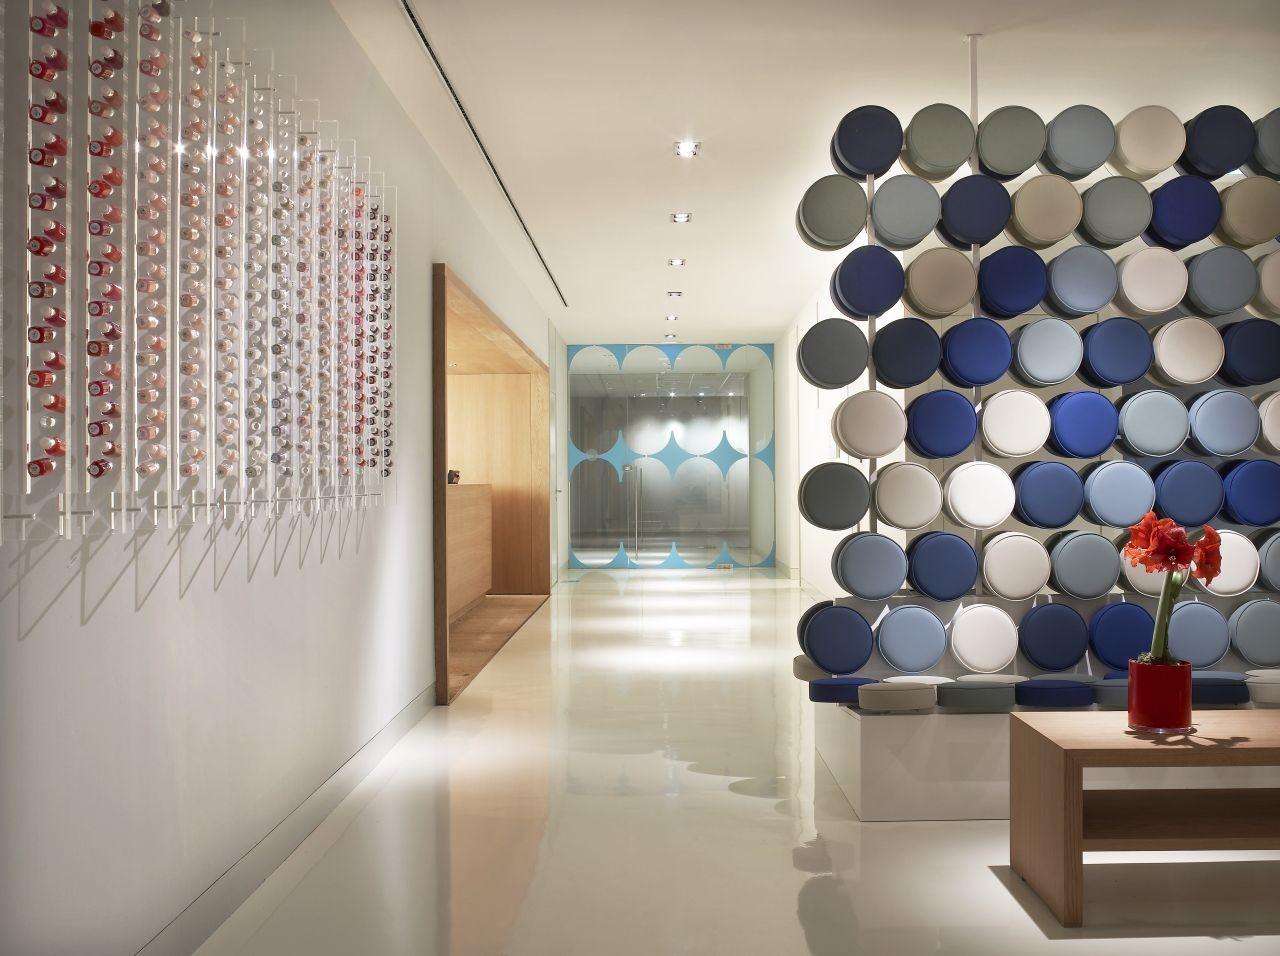 Gallery of w barcelona hotel ricardo bofill 36 for Spa hotel w barcelona